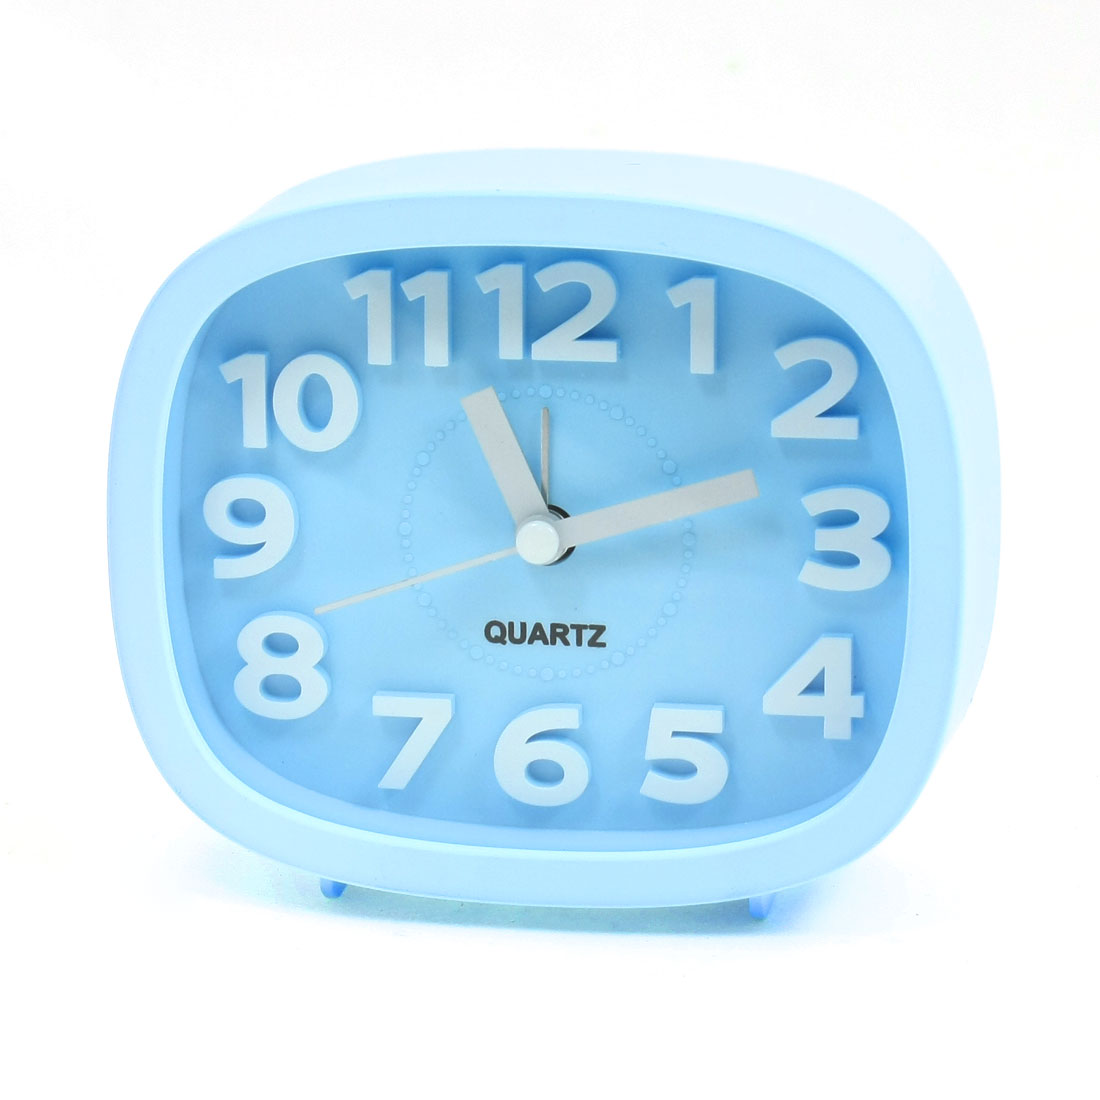 Trapezoid Battery Powered Desk Quartz Alarm Clock Light Blue